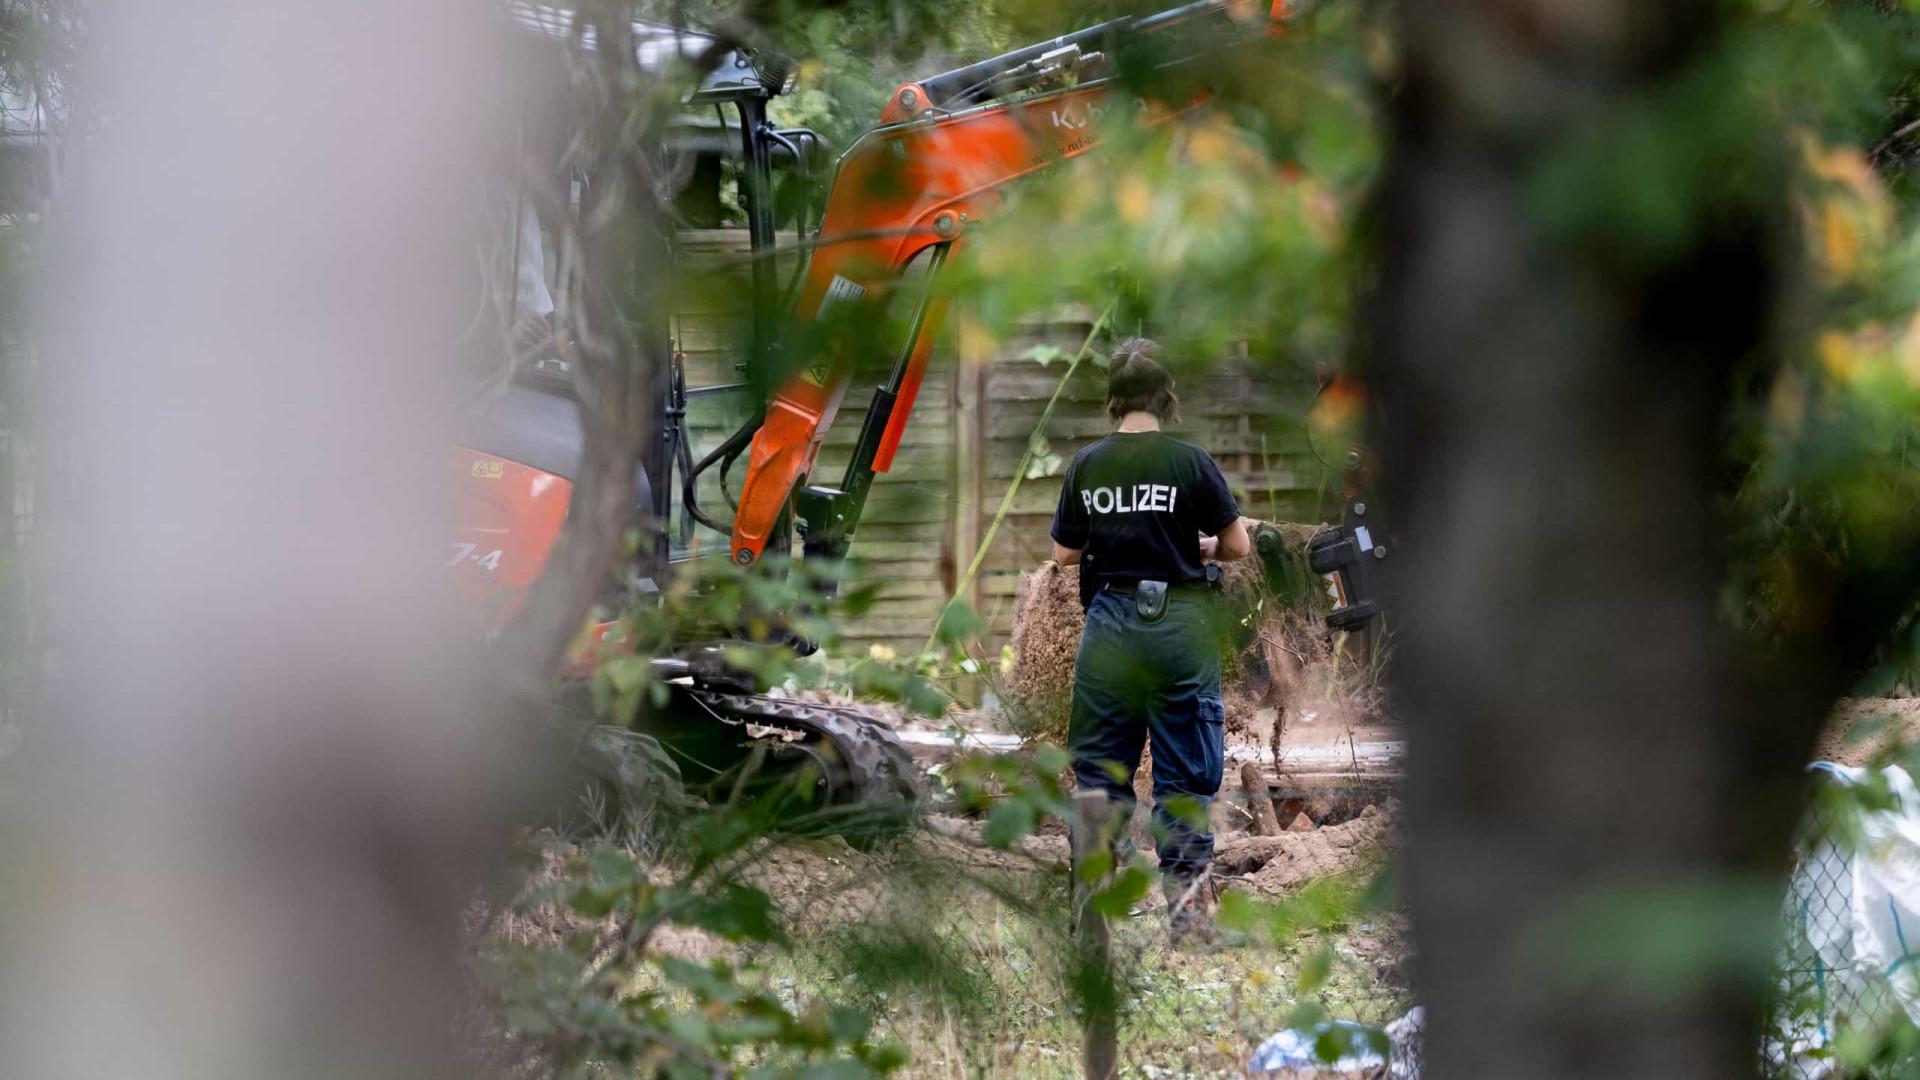 Imagens das buscas junto a casa onde morou suspeito no Caso Maddie